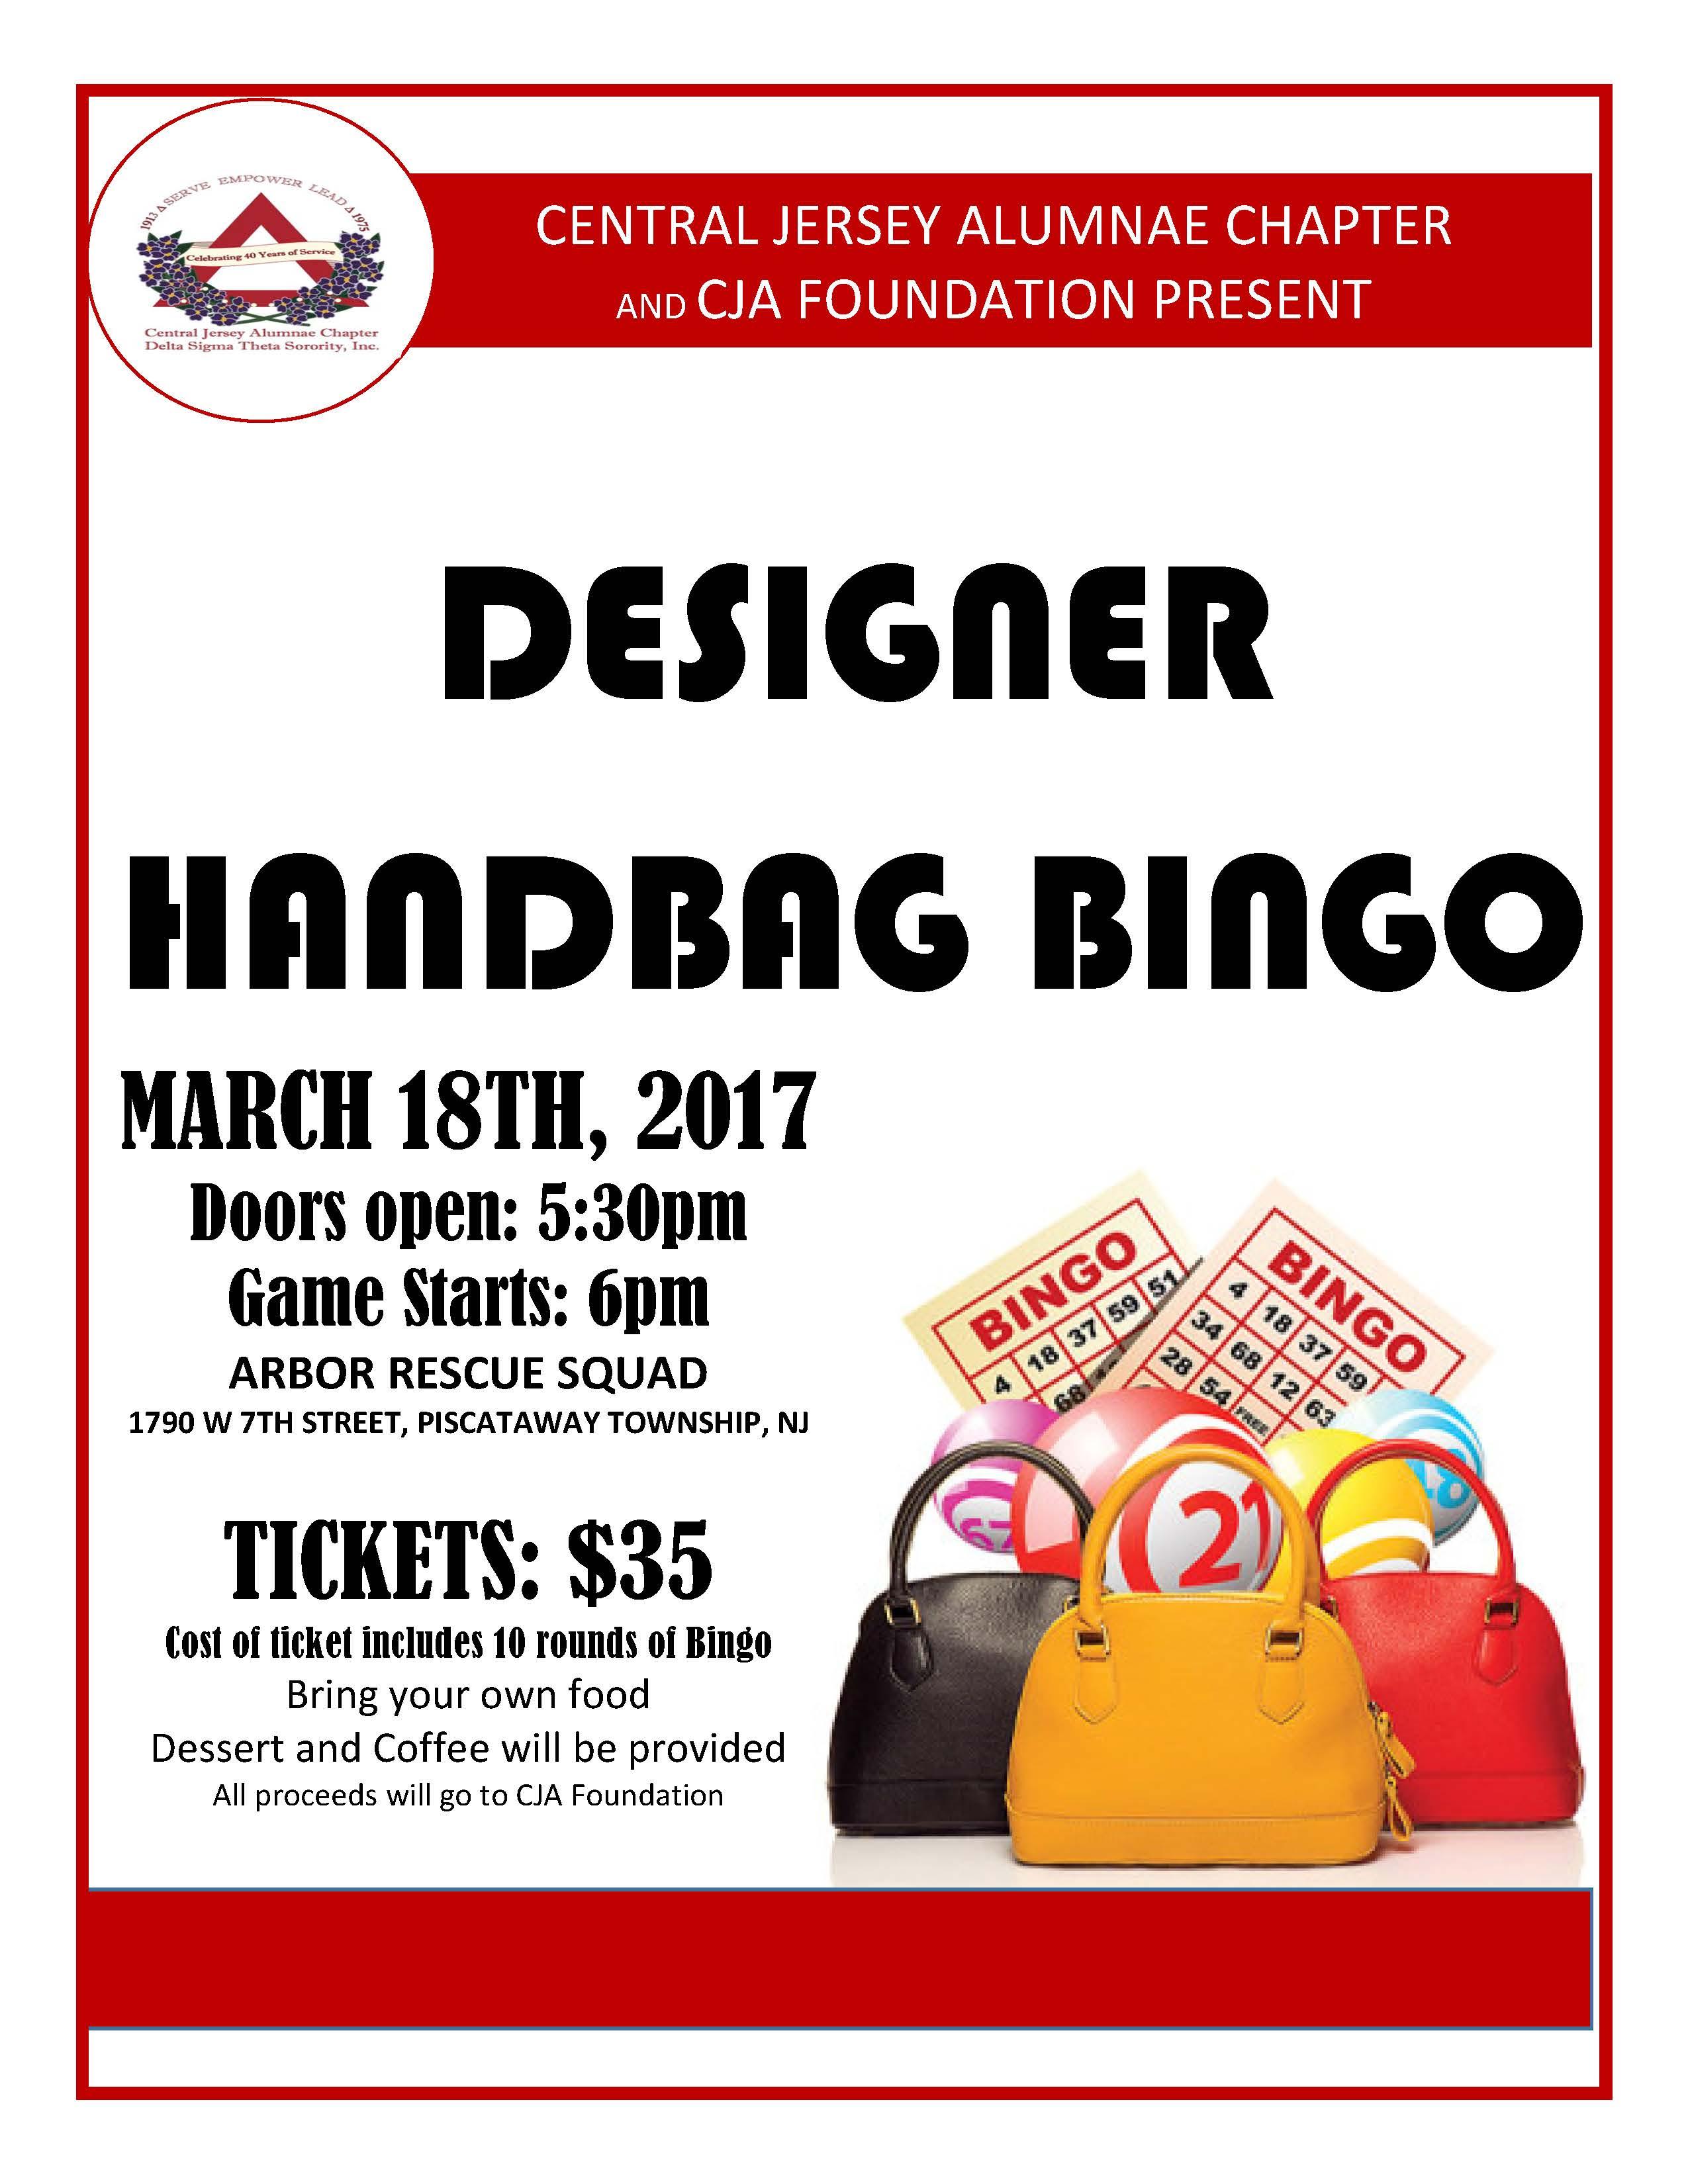 Handbag Bingo Central Jersey Alumnae Chapter Of Delta